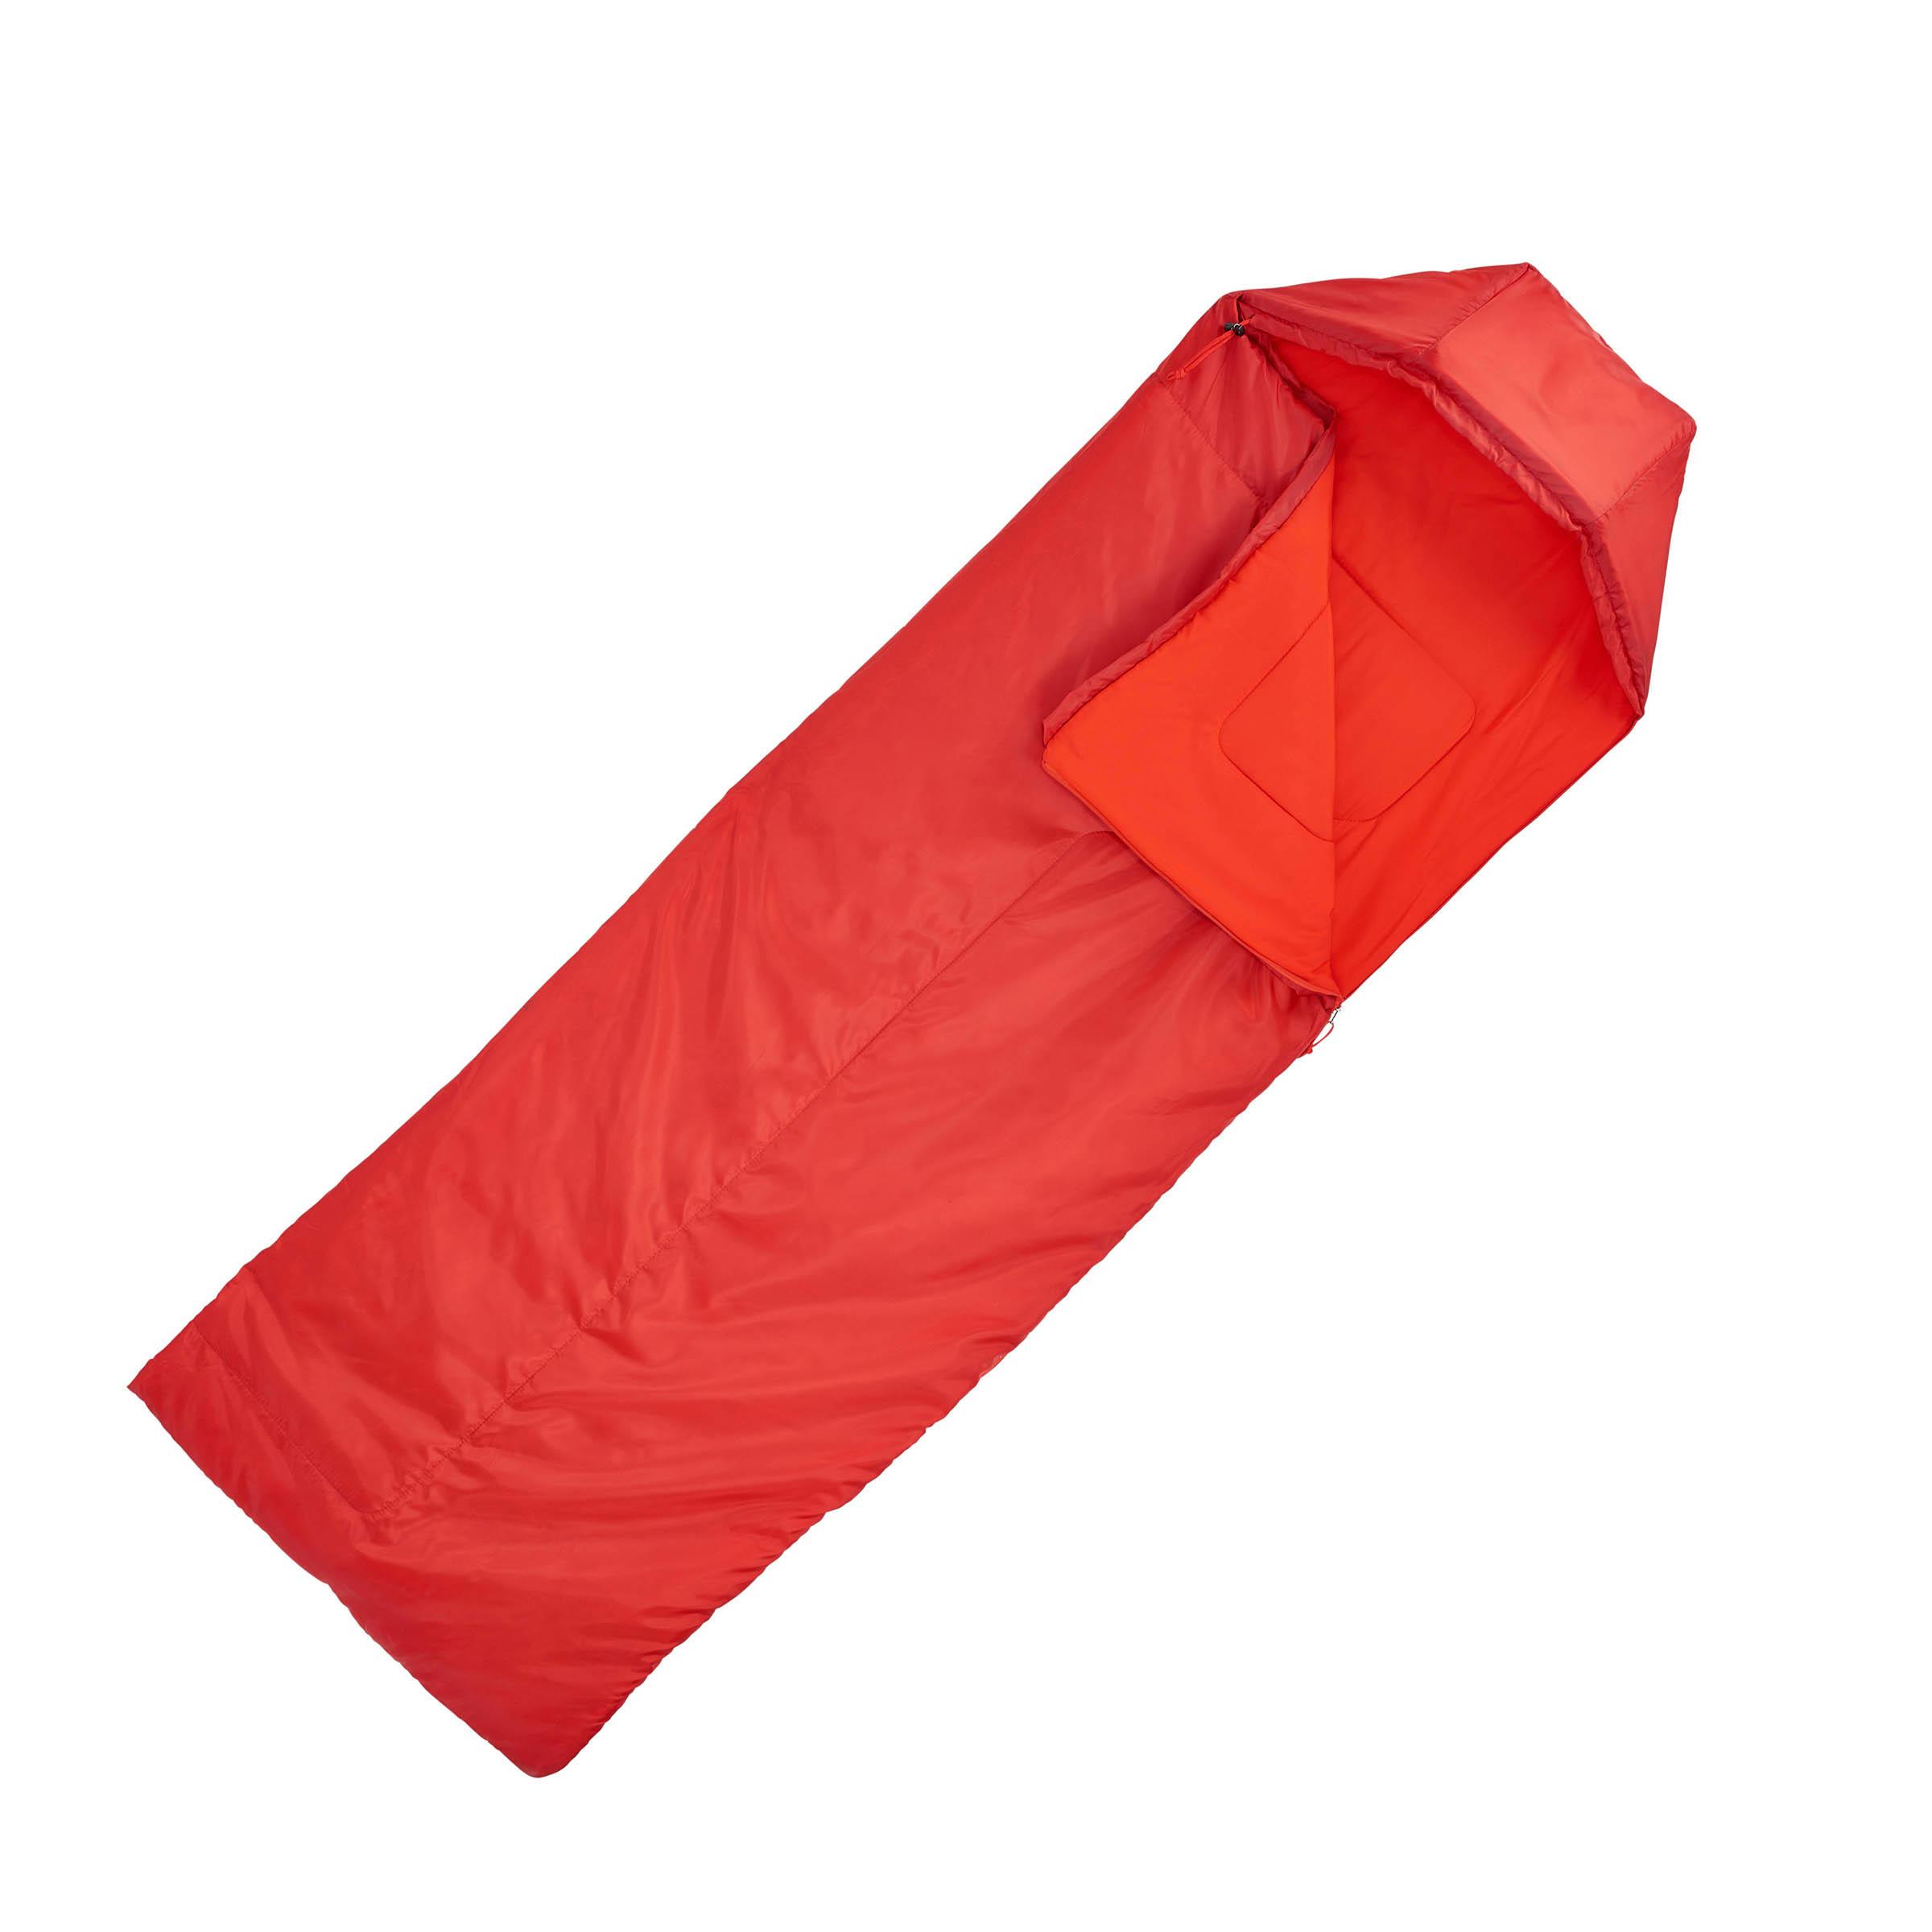 Saco de dormir de camping FORCLAZ 10°